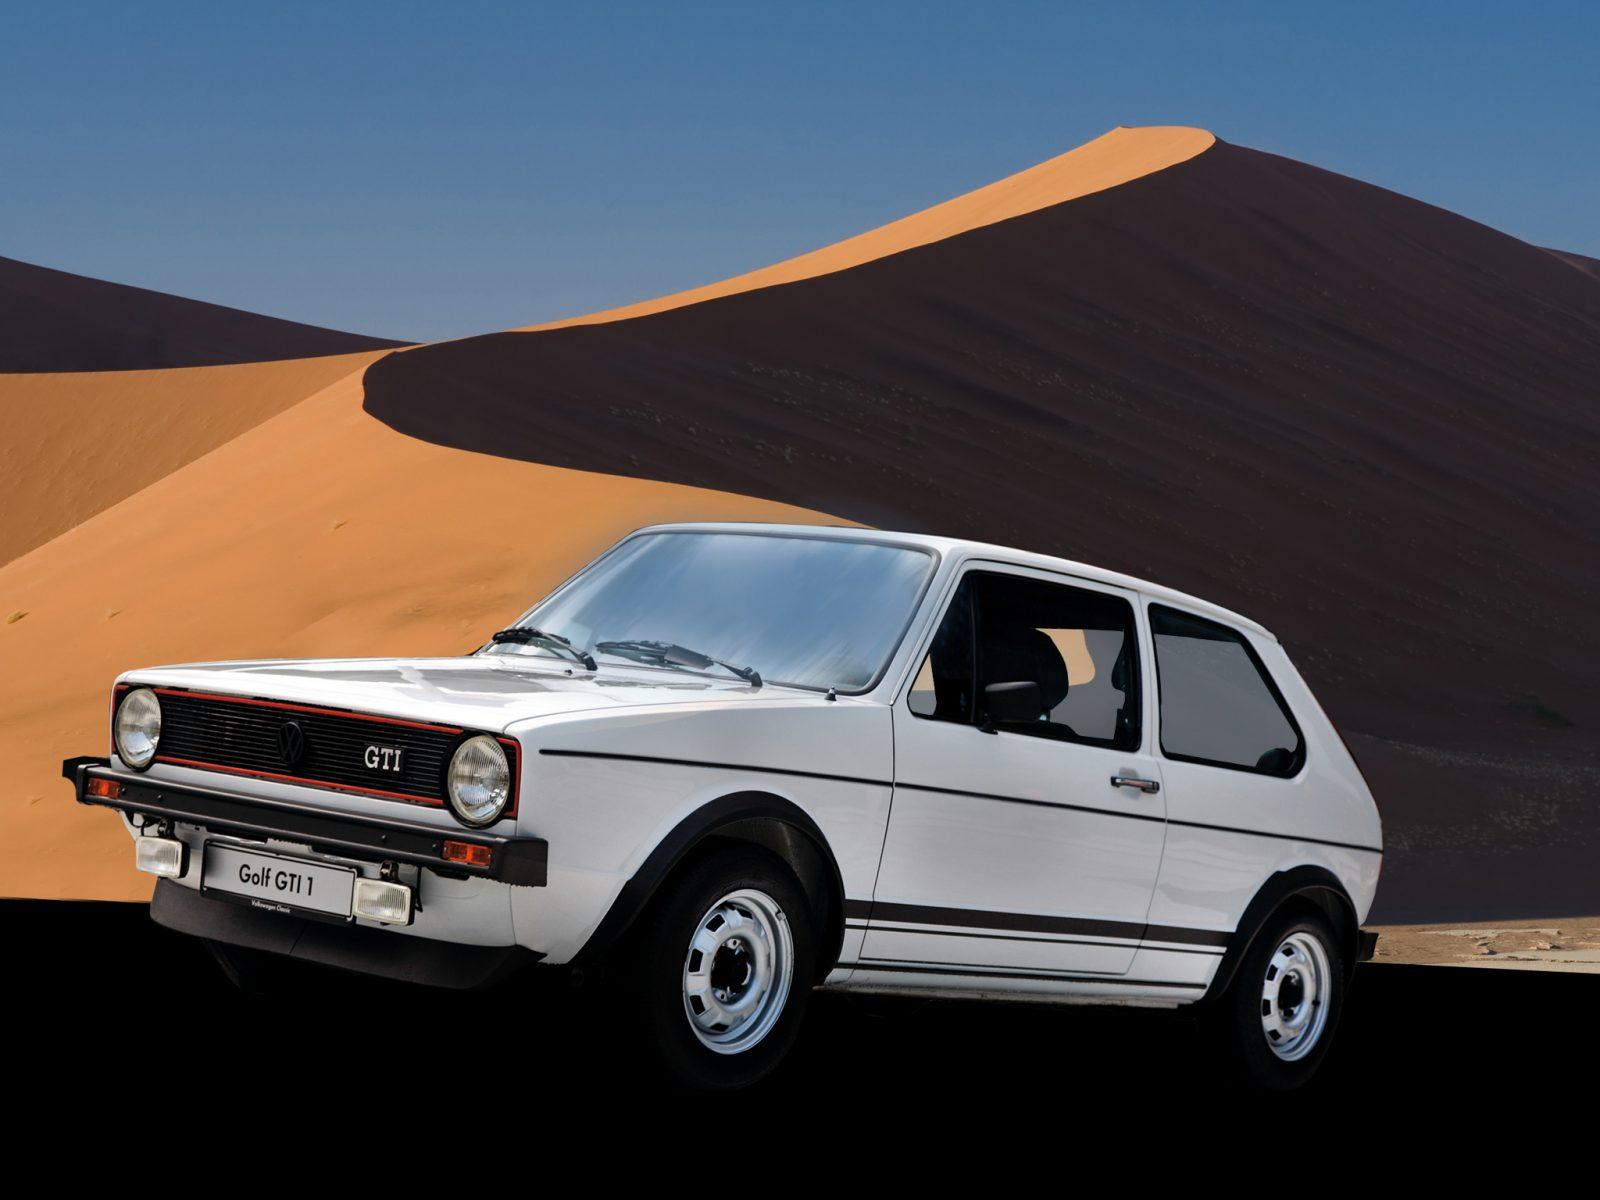 volkswagen golf gti mk1 branco lateral nas dunas